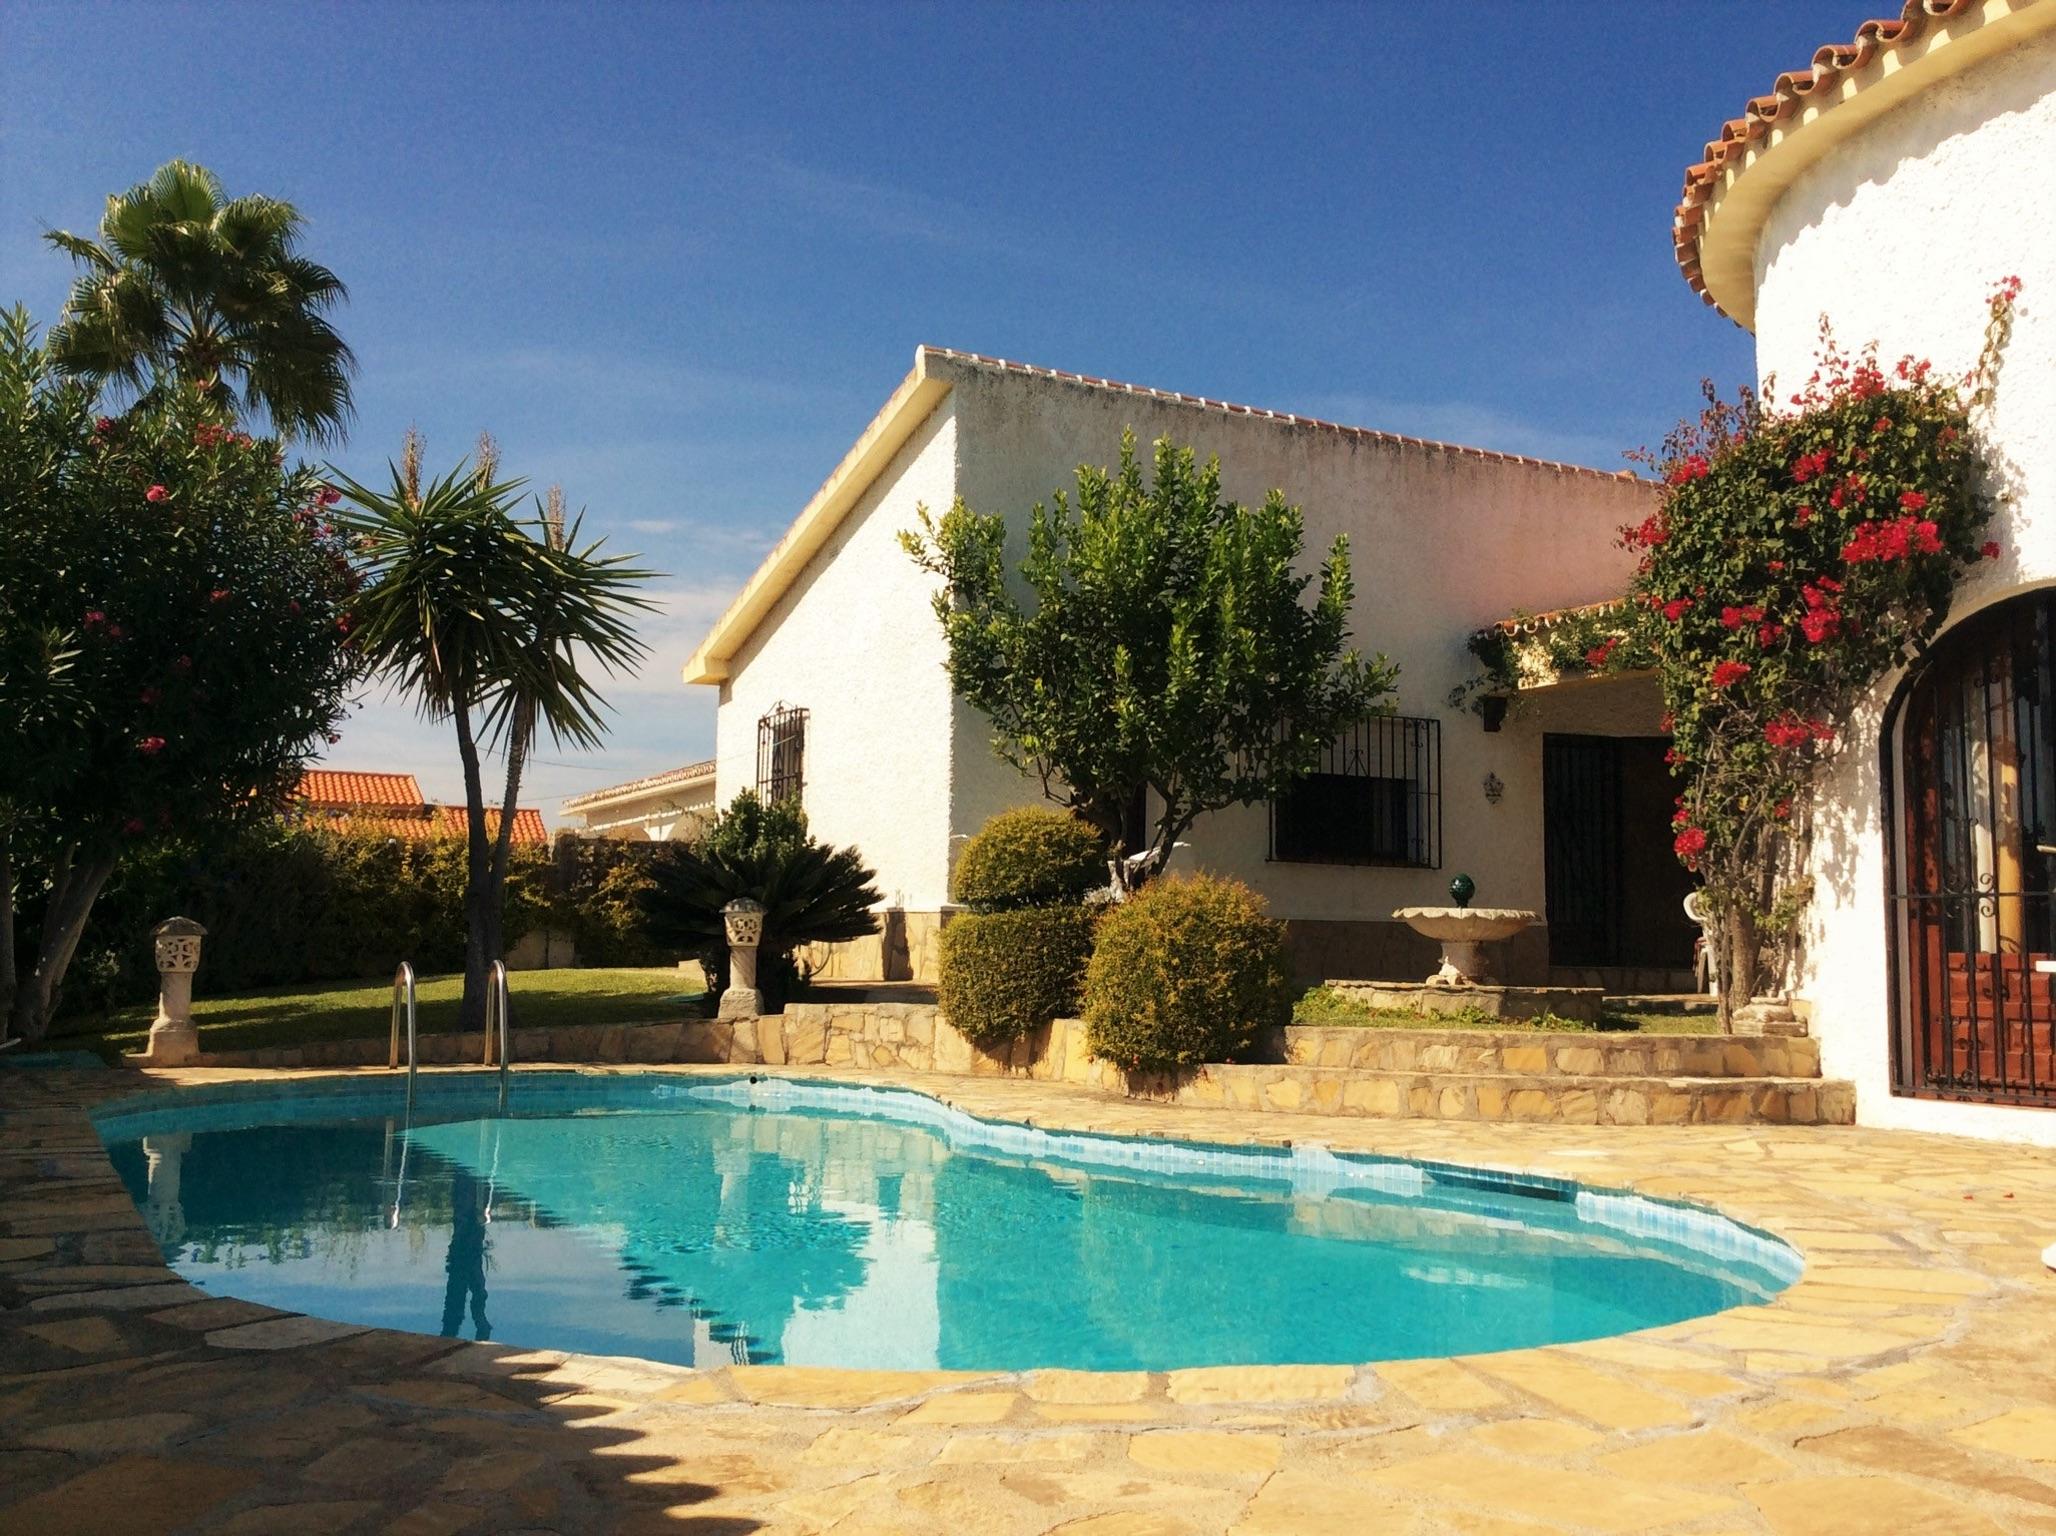 Stilvolles Haus Bei Benajarafe In Andalusien Mit Privatpool Grill